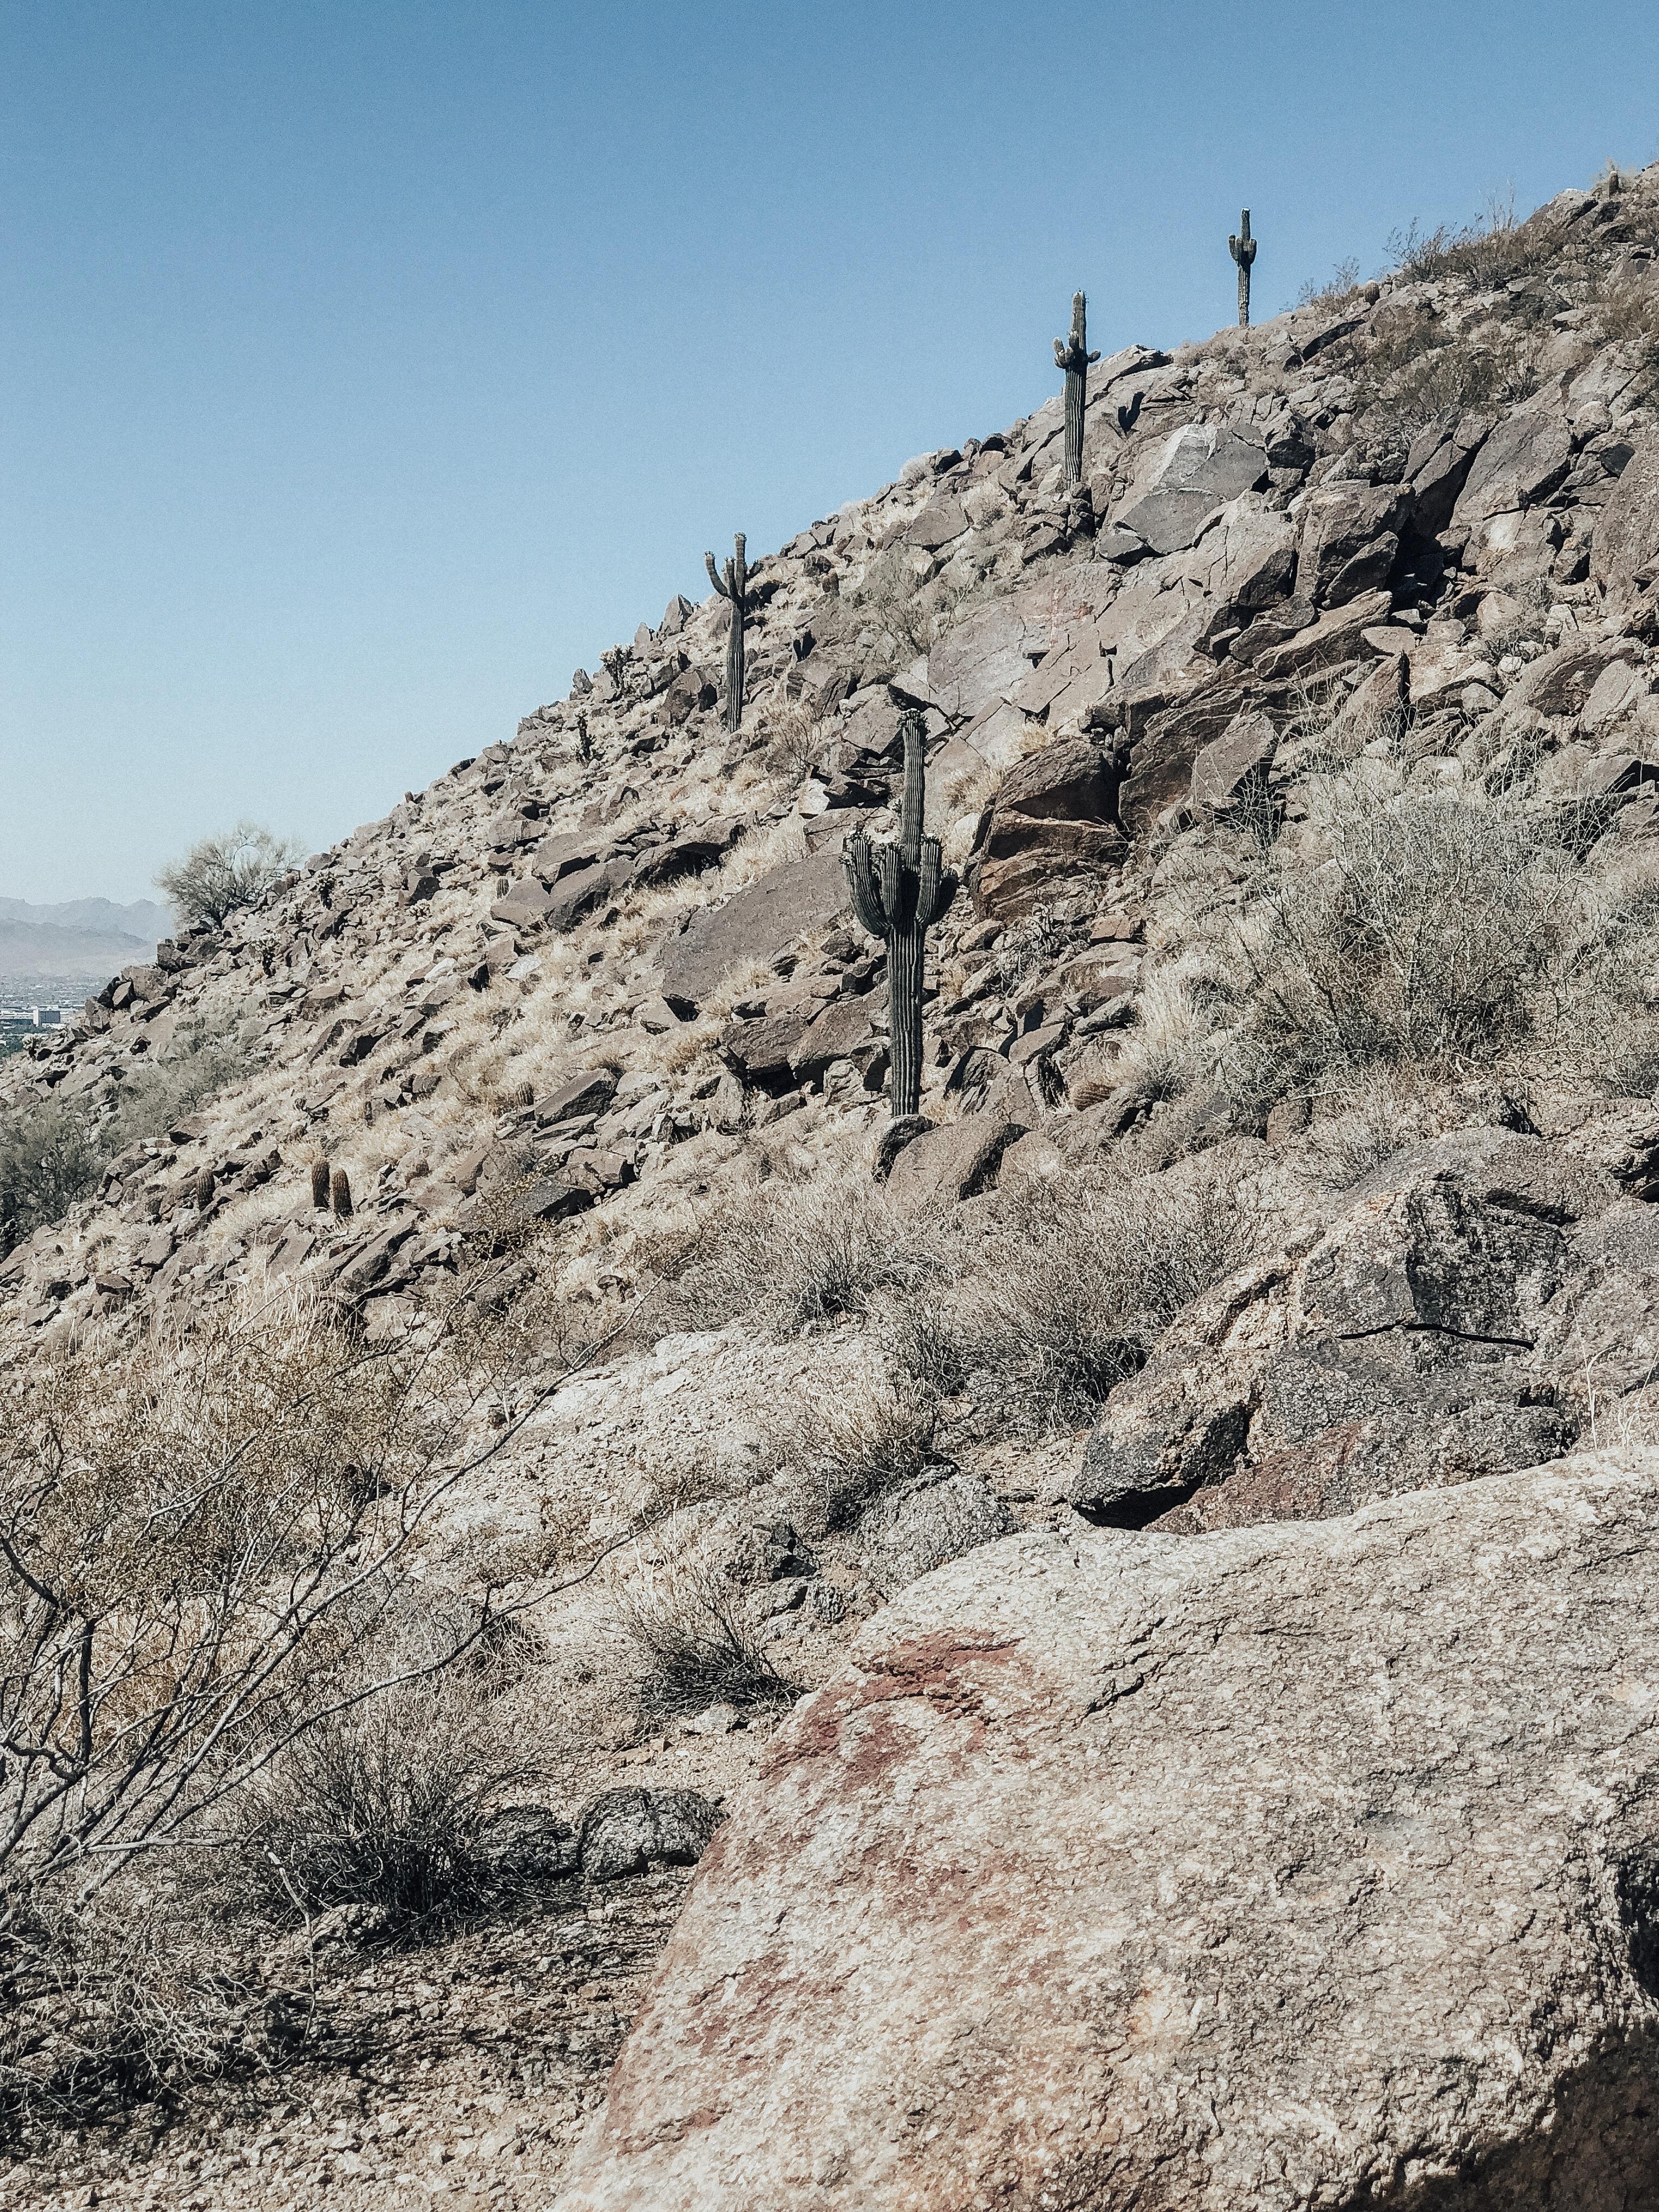 Arizona travel guide